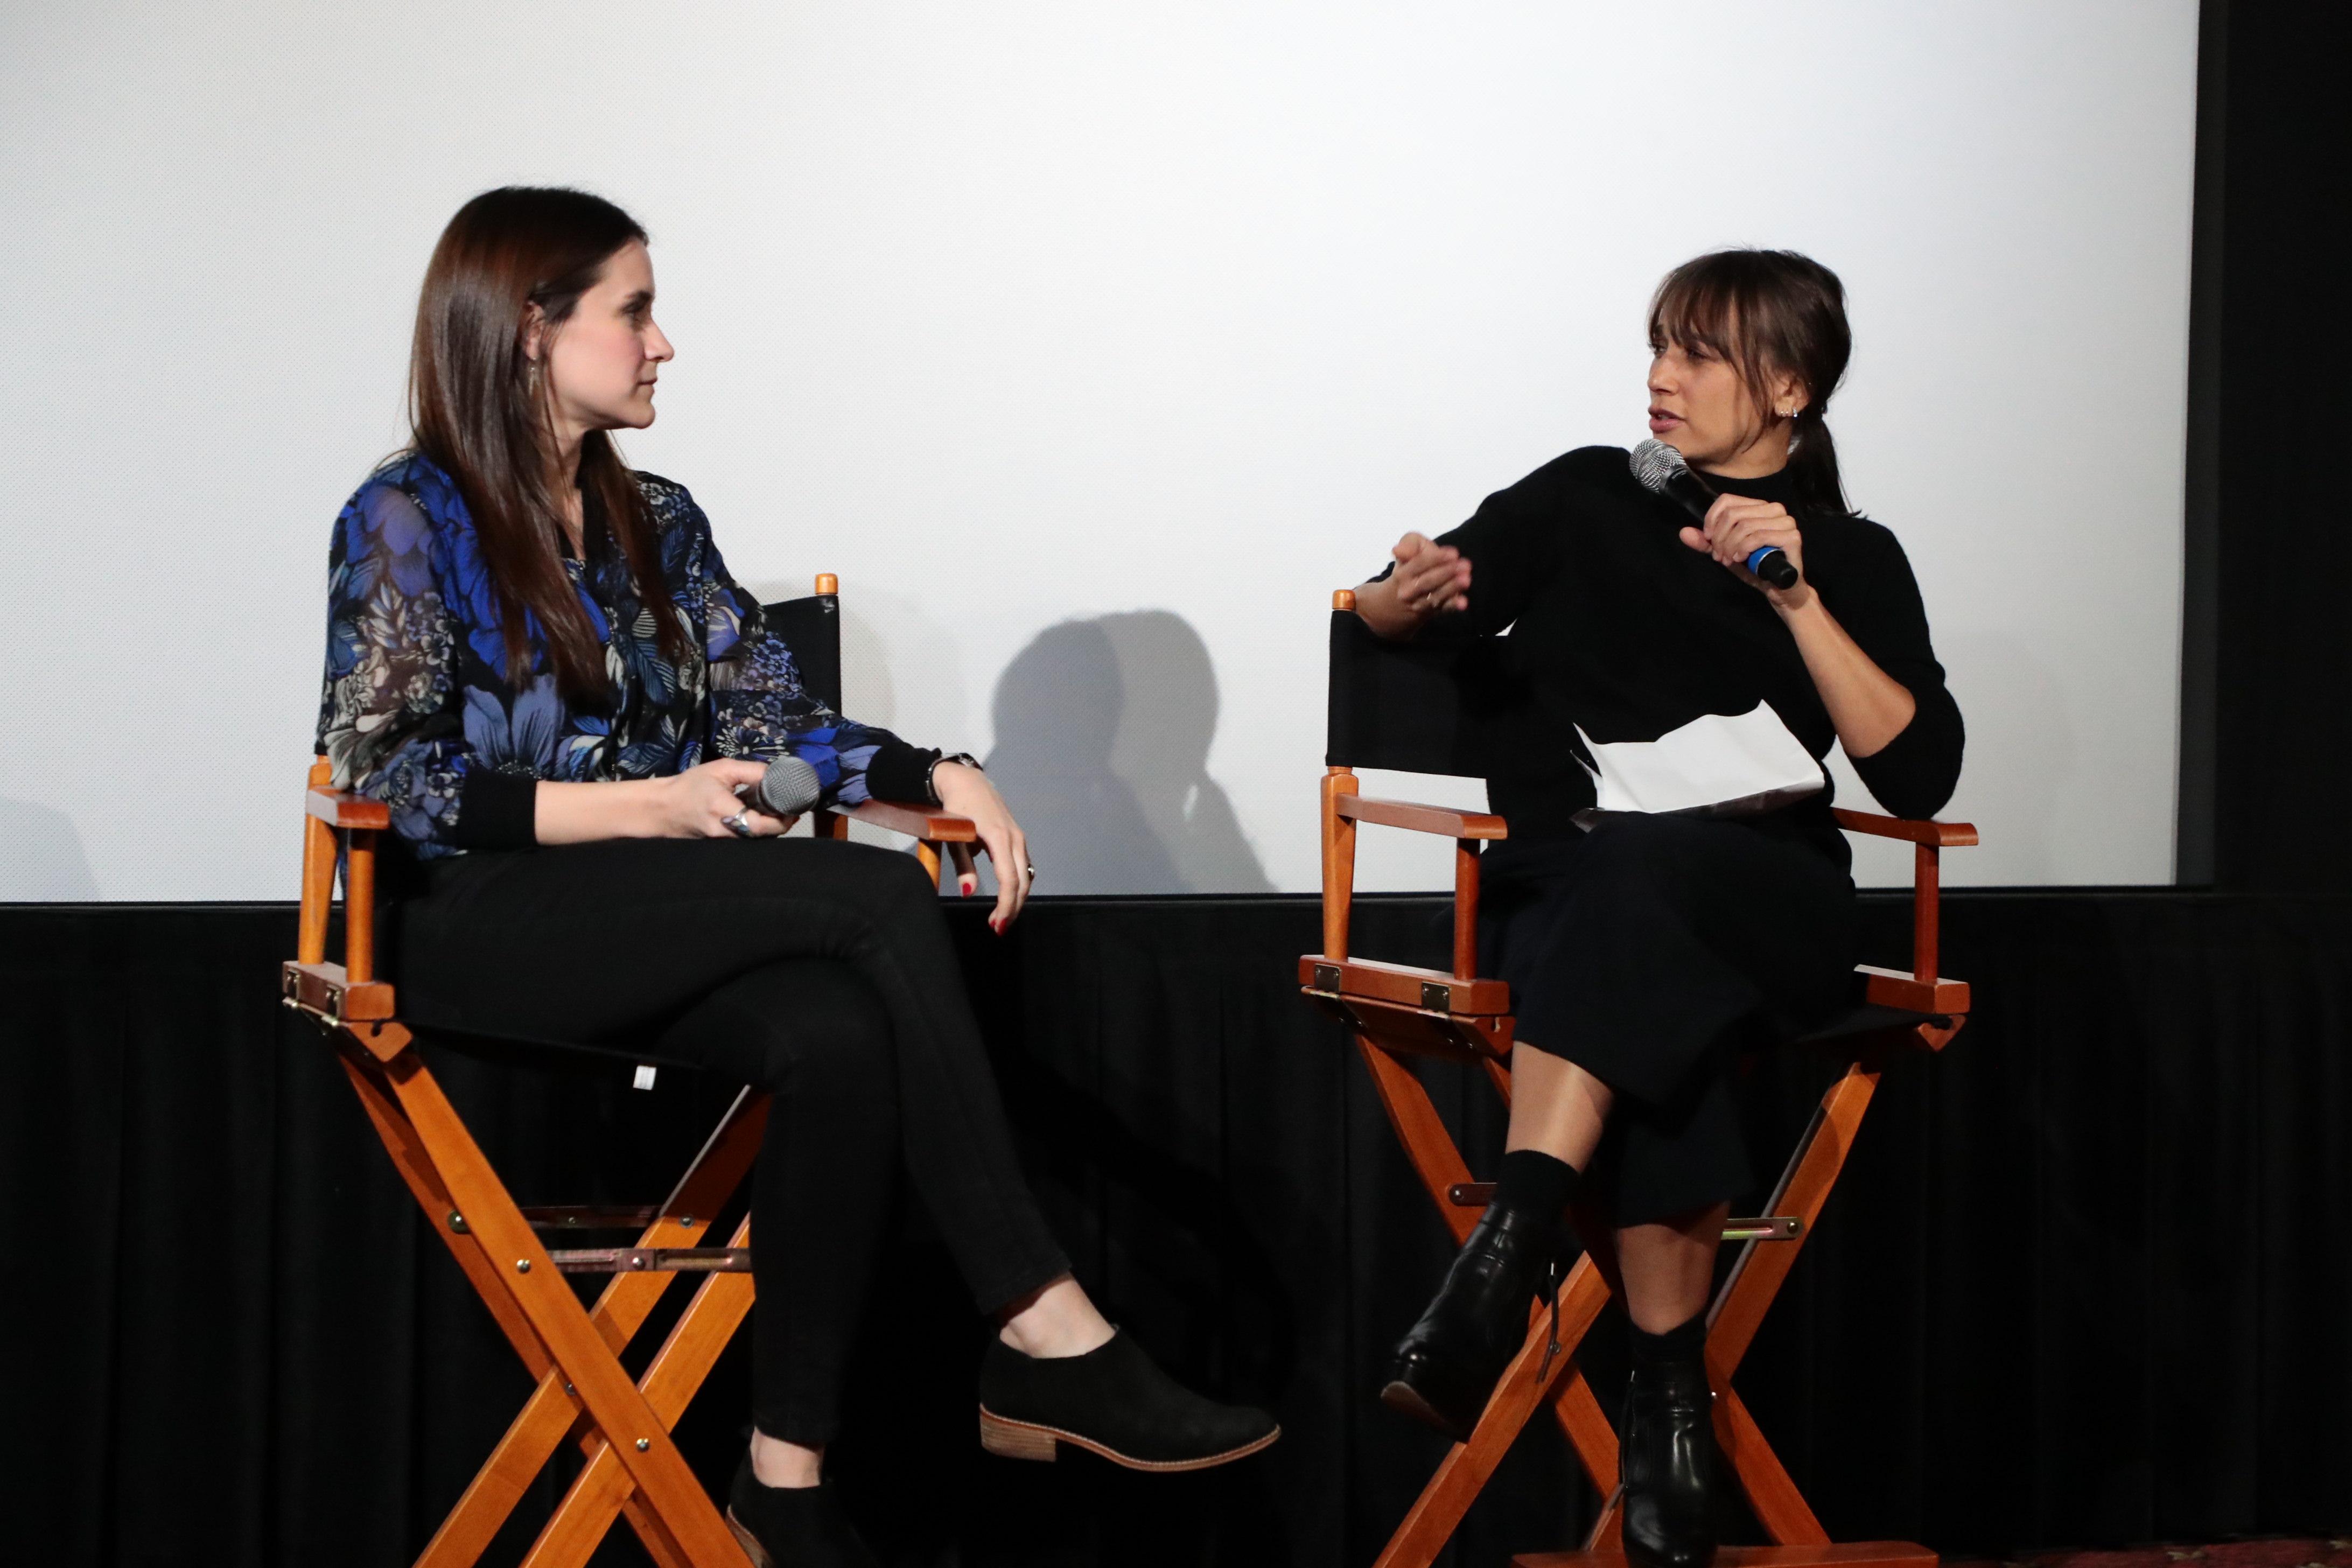 Director/Producer Elaine McMillion Sheldon and Rashida JonesNetflix Original Documentary short 'Heroin(e)' moderated by Rashida Jones, Beverly Hils, USA - 20 February 2018